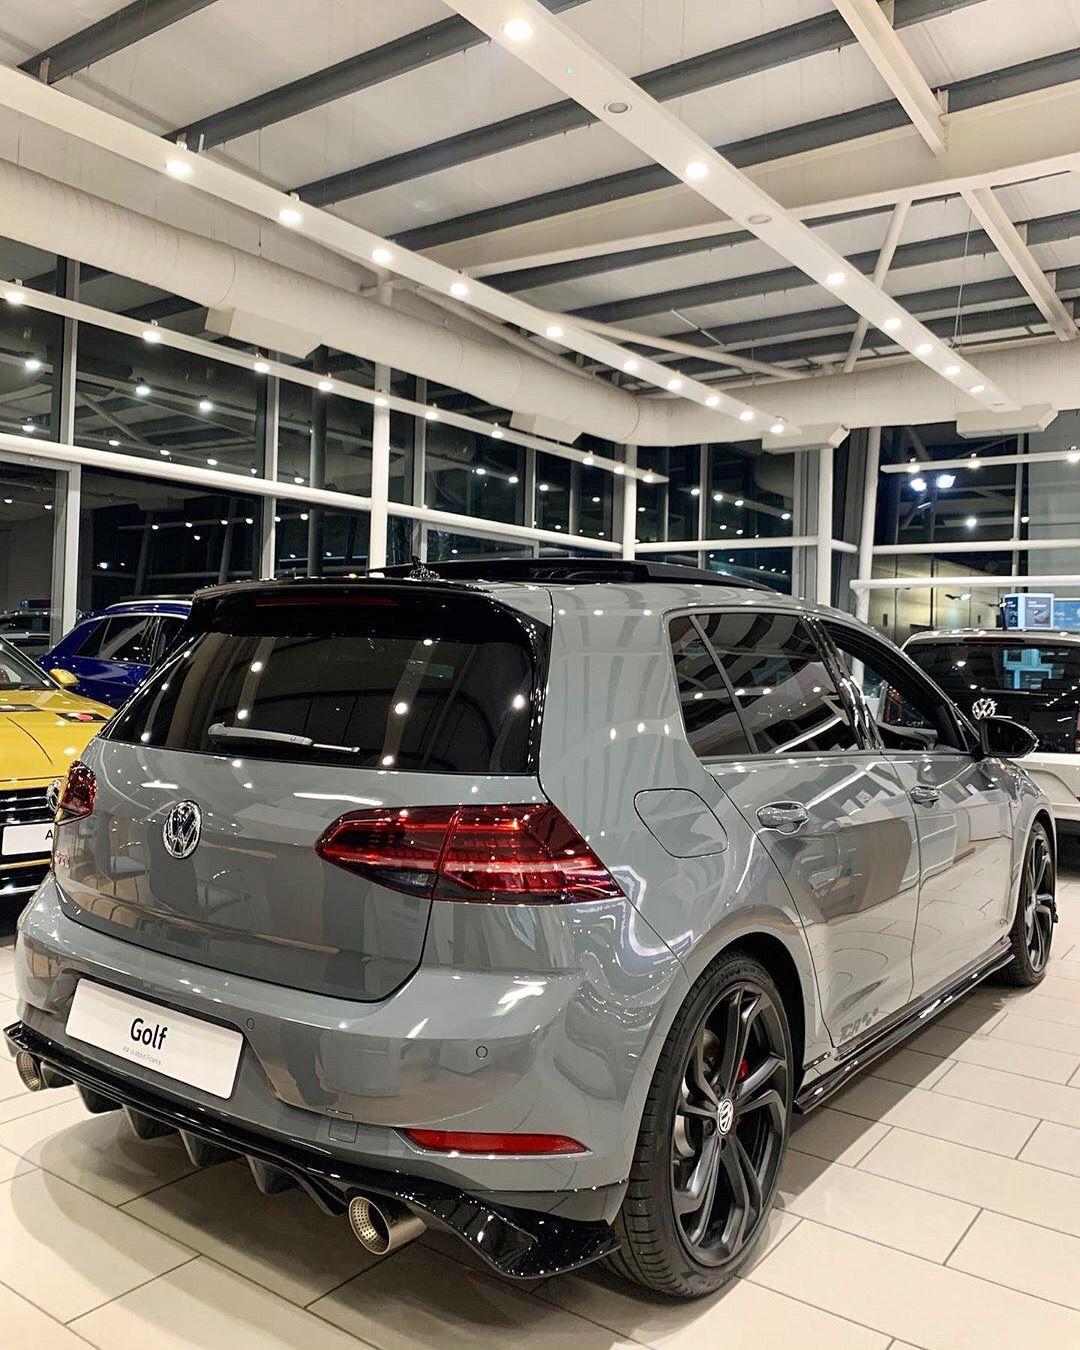 Golf Gti Tcr In 2020 Vw Golf R Mk7 Volkswagen Golf R Volkswagen Golf Gti